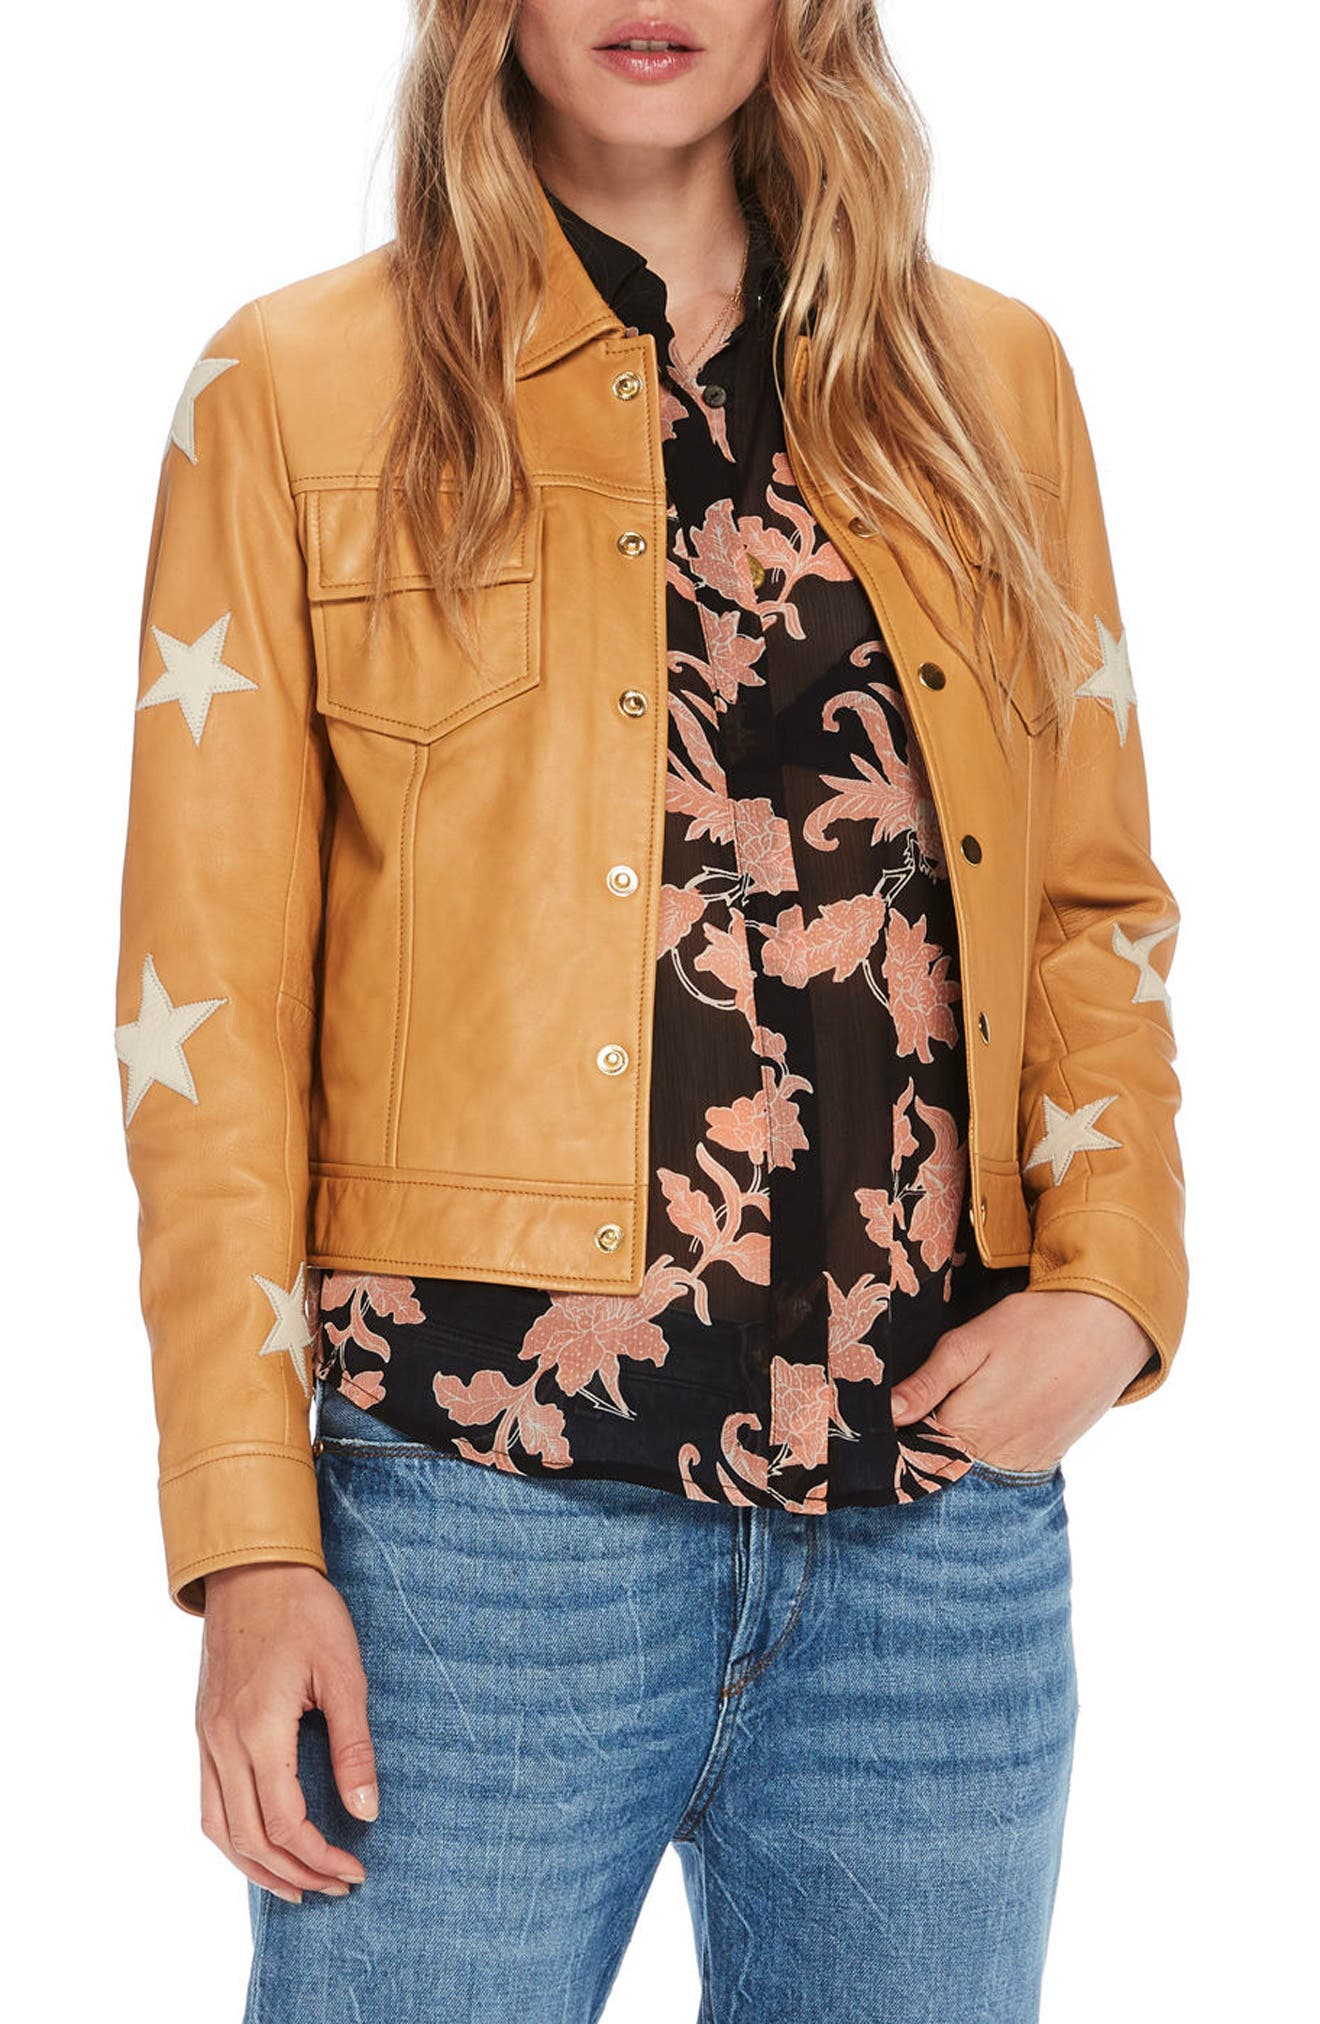 Sheepskin Leather Shirt Jacket,                             Main thumbnail 1, color,                             Color 1942 Sahara